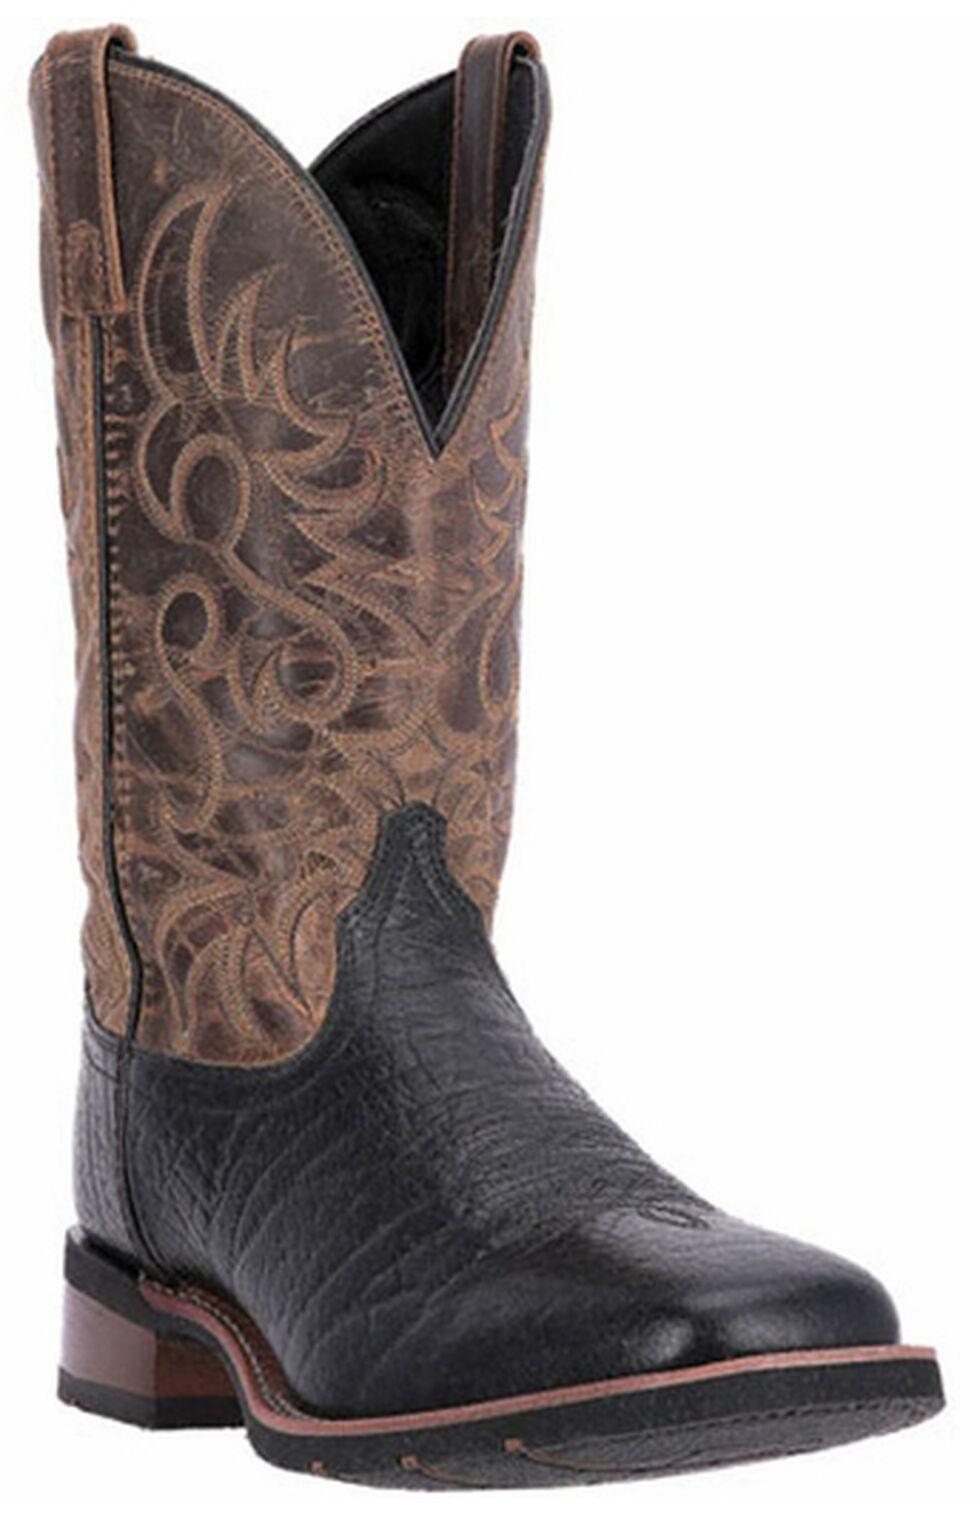 Laredo Topeka Cowboy Boots - Square Toe, Black, hi-res